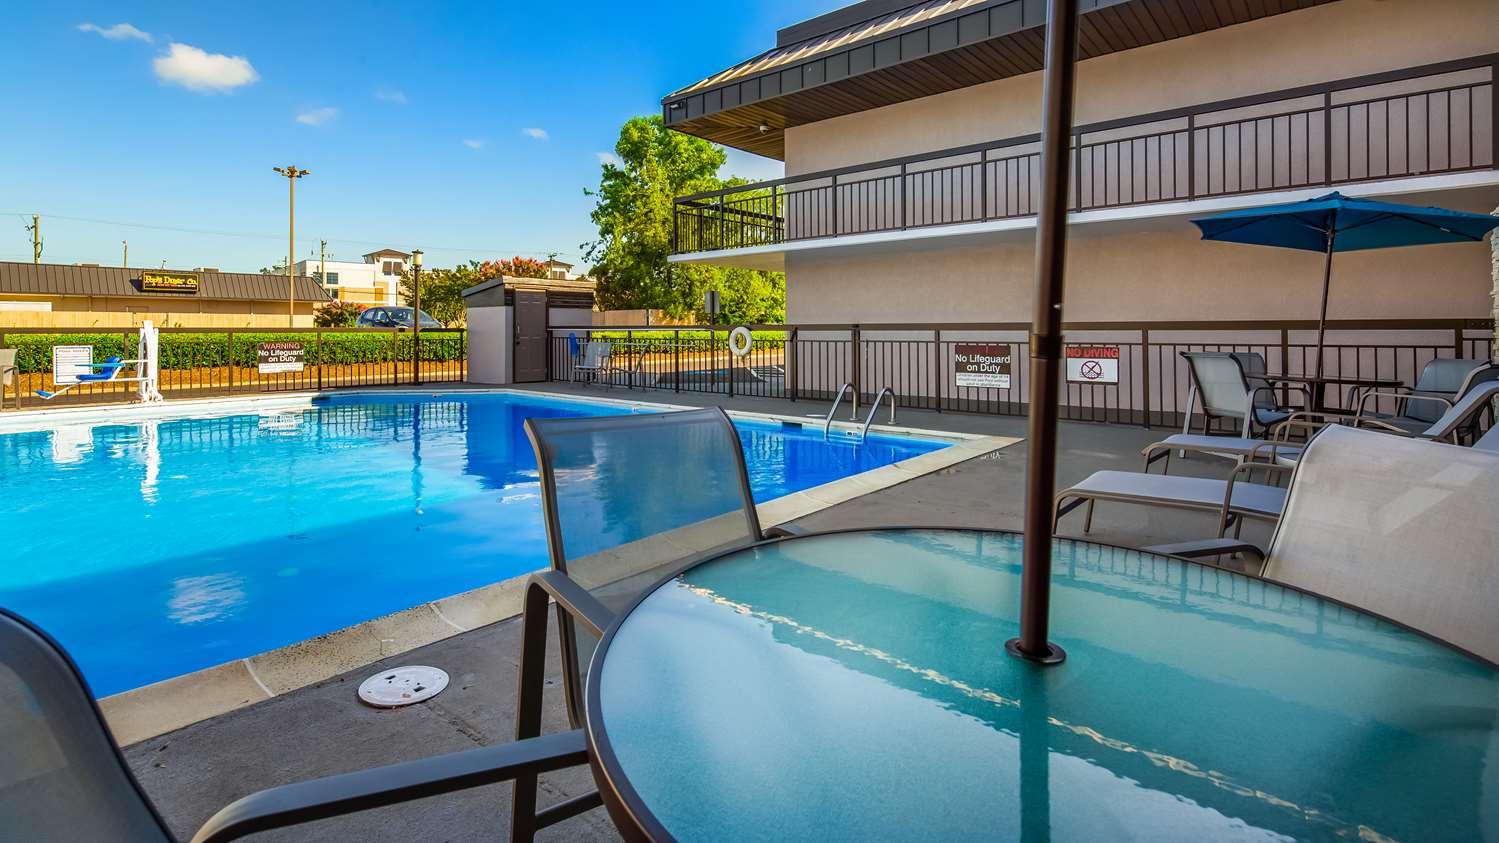 Pool - Best Western Center Inn Virginia Beach